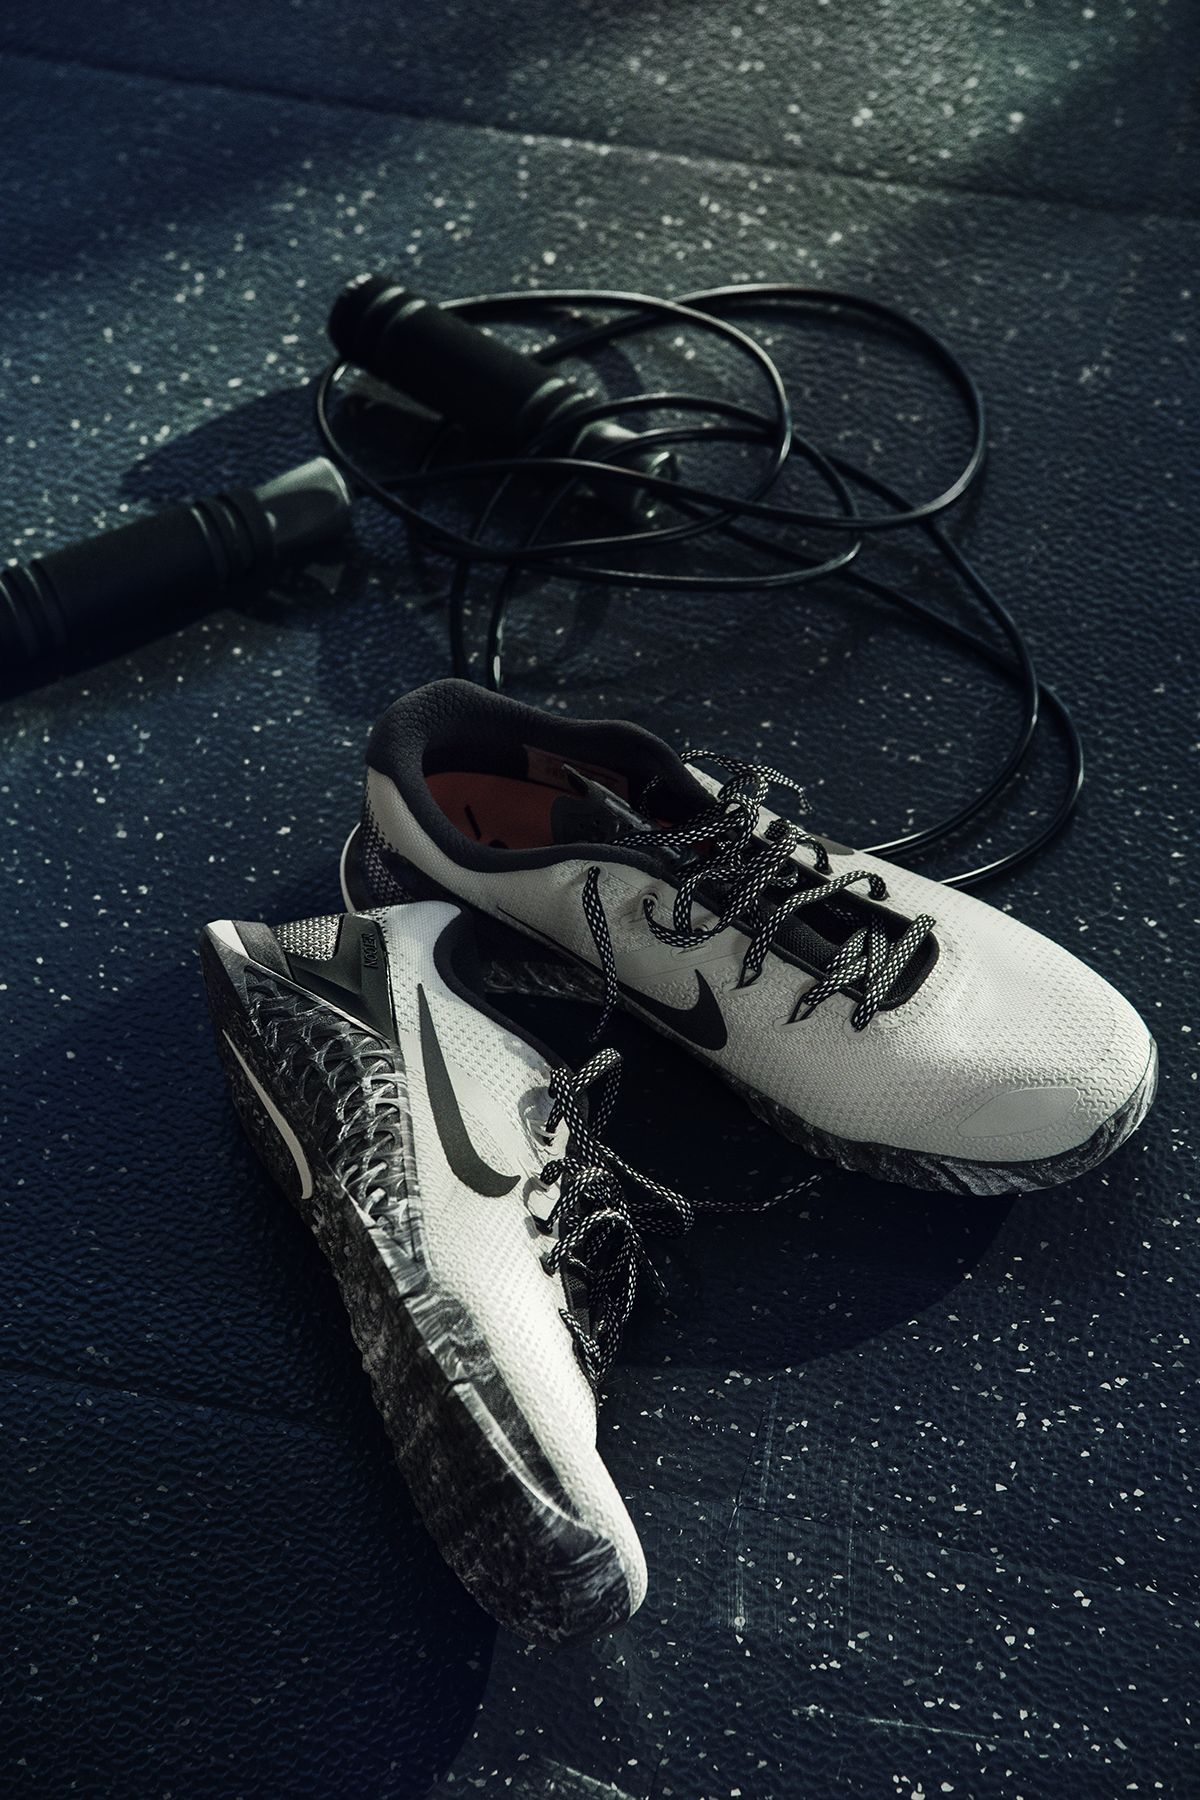 b3458db7f4785 Nike Training to Launch the Metcon 4 in January 2018 - EU Kicks Sneaker  Magazine